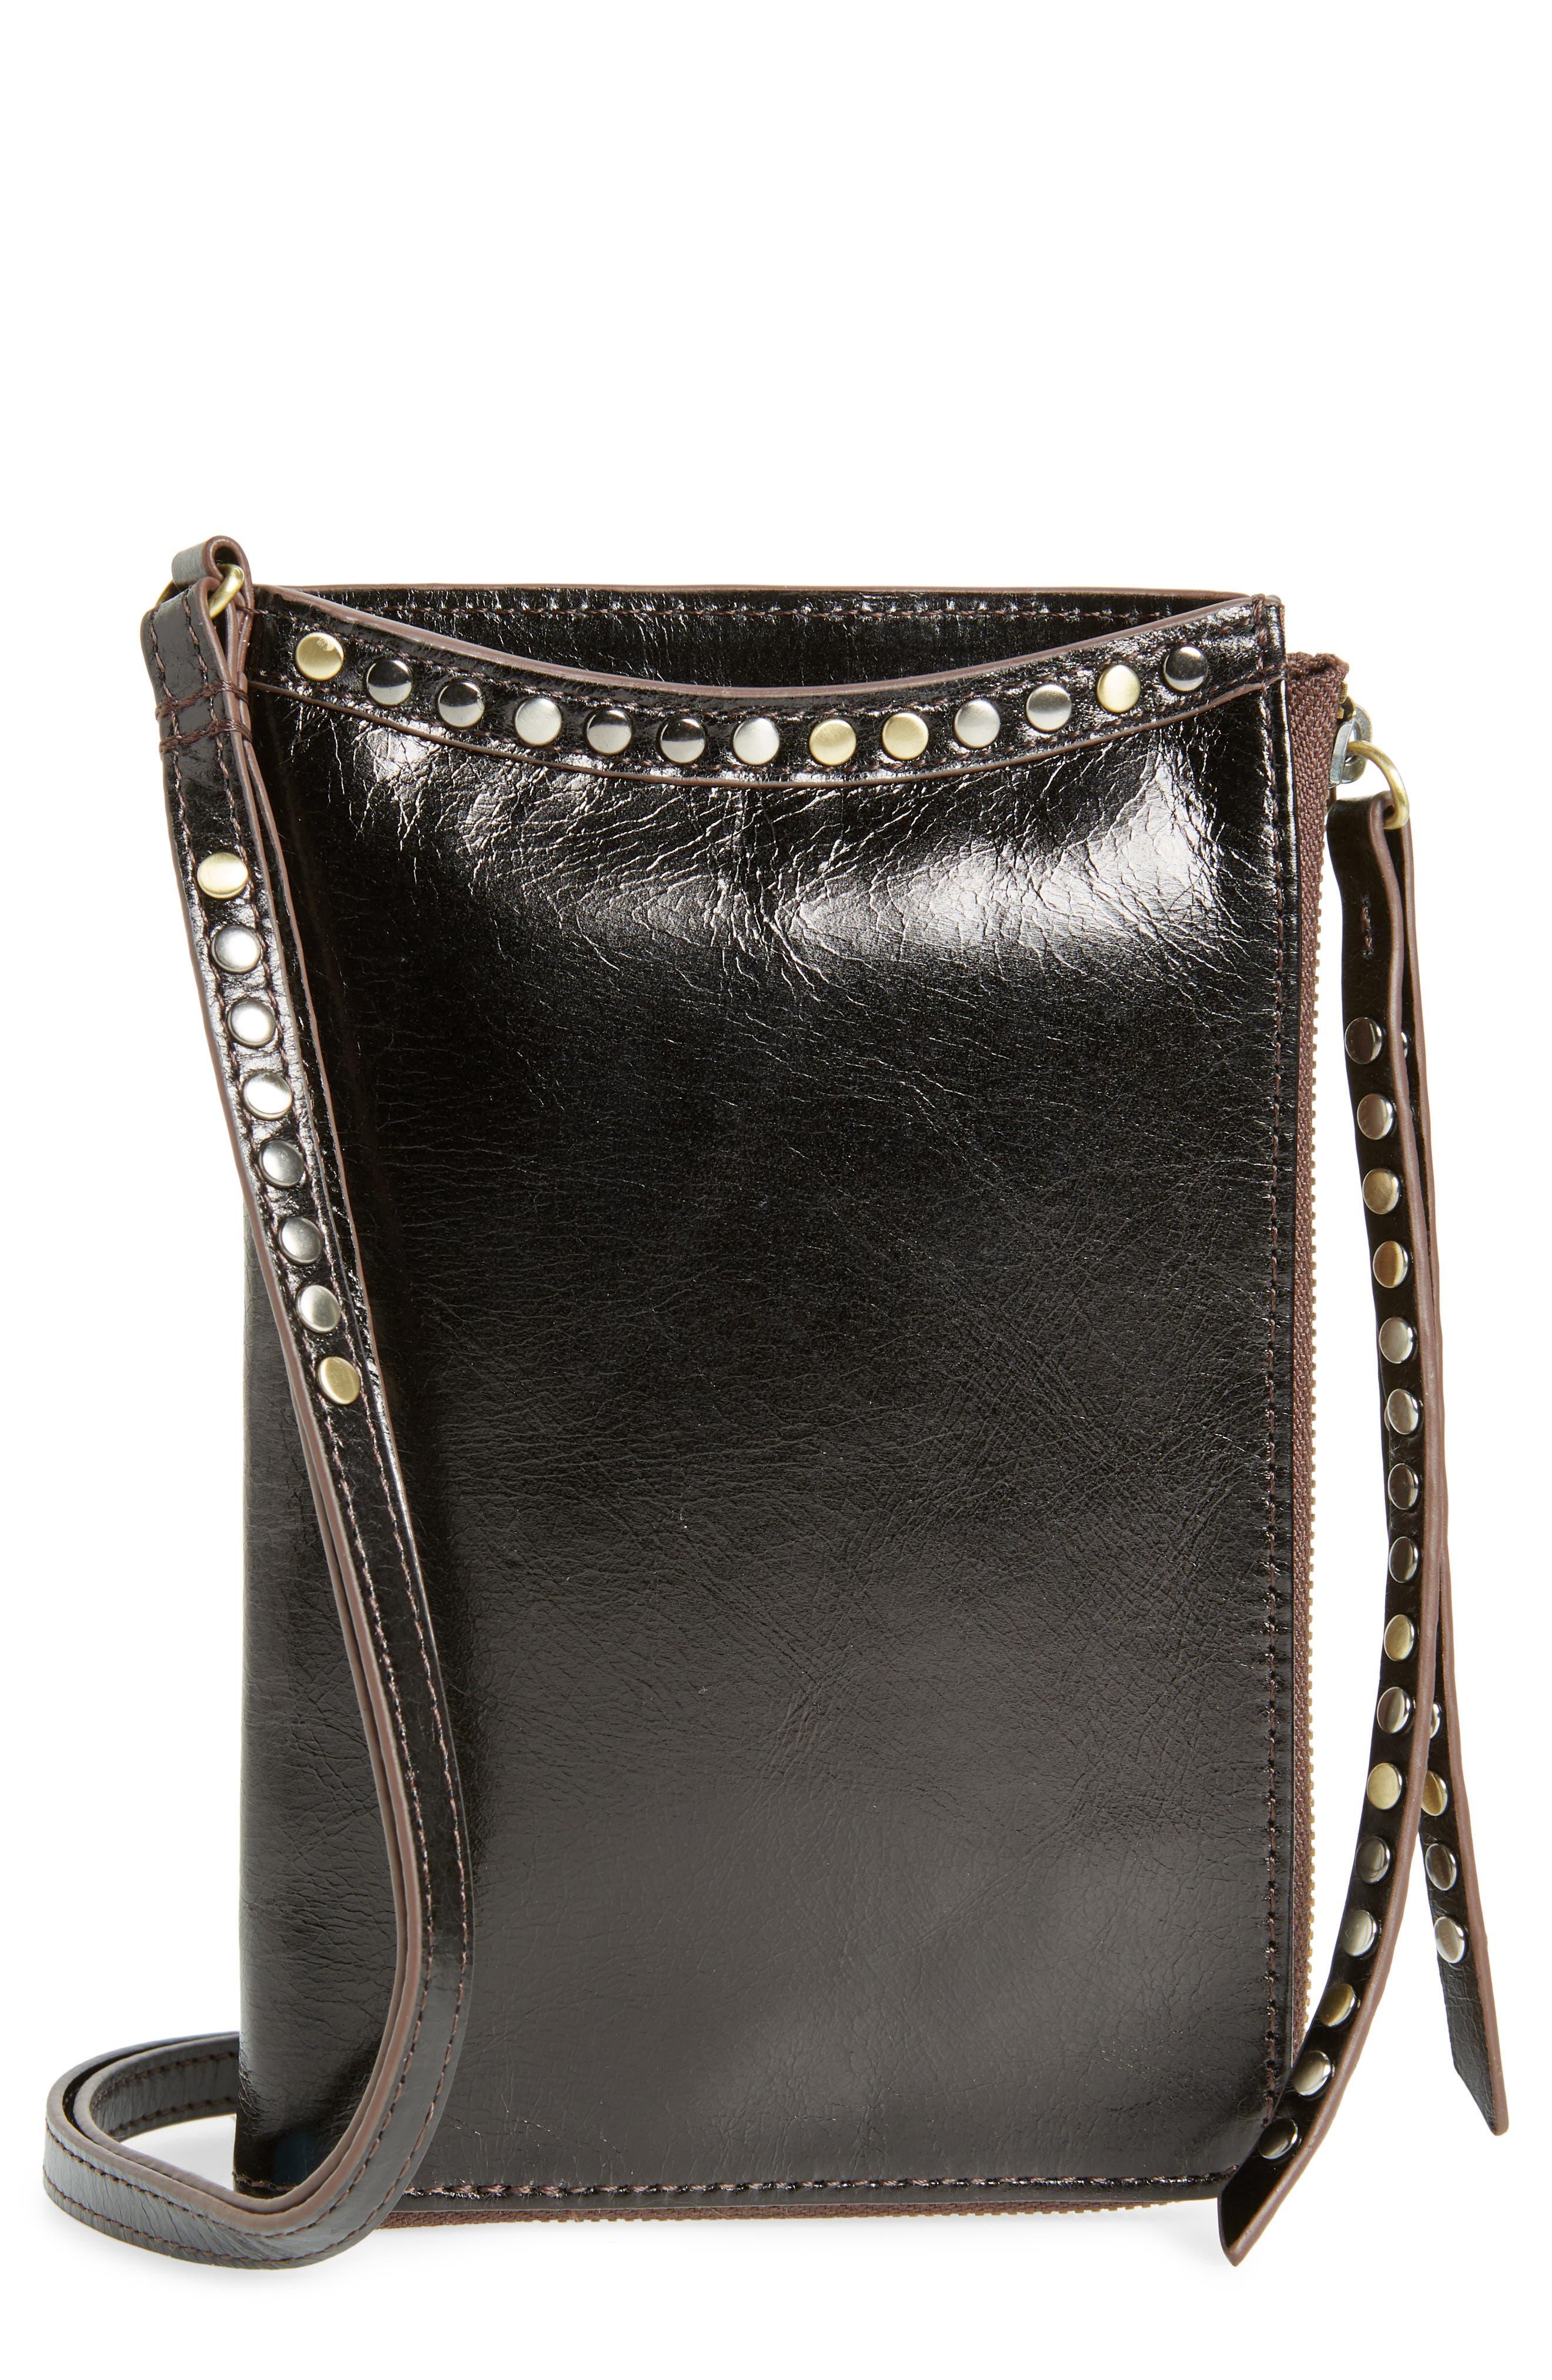 HOBO Moxie Leather Crossbody Bag, Main, color, BLACK